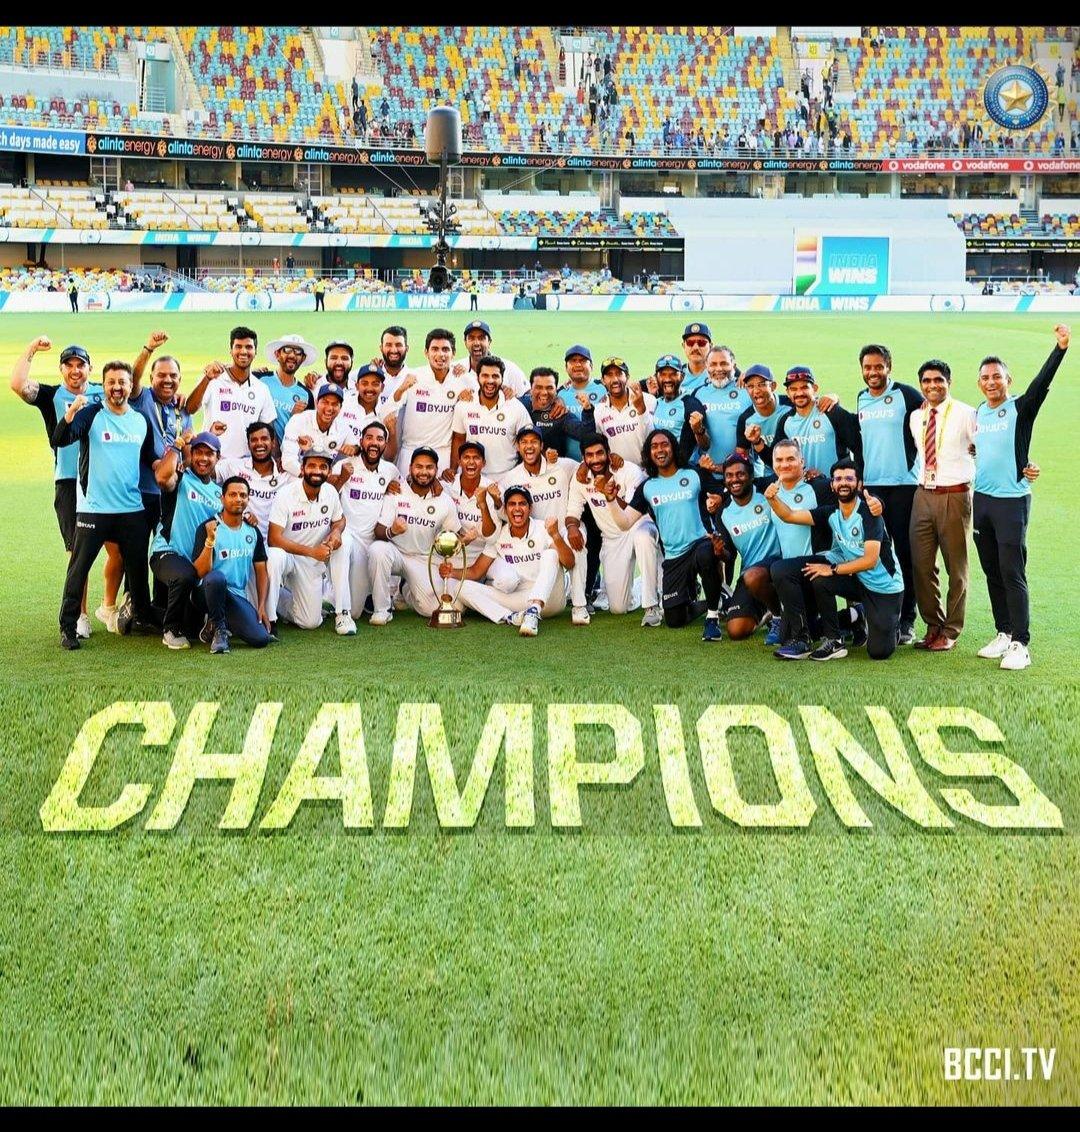 #INDvsAUS #SoundOfChampions #TeamIndia